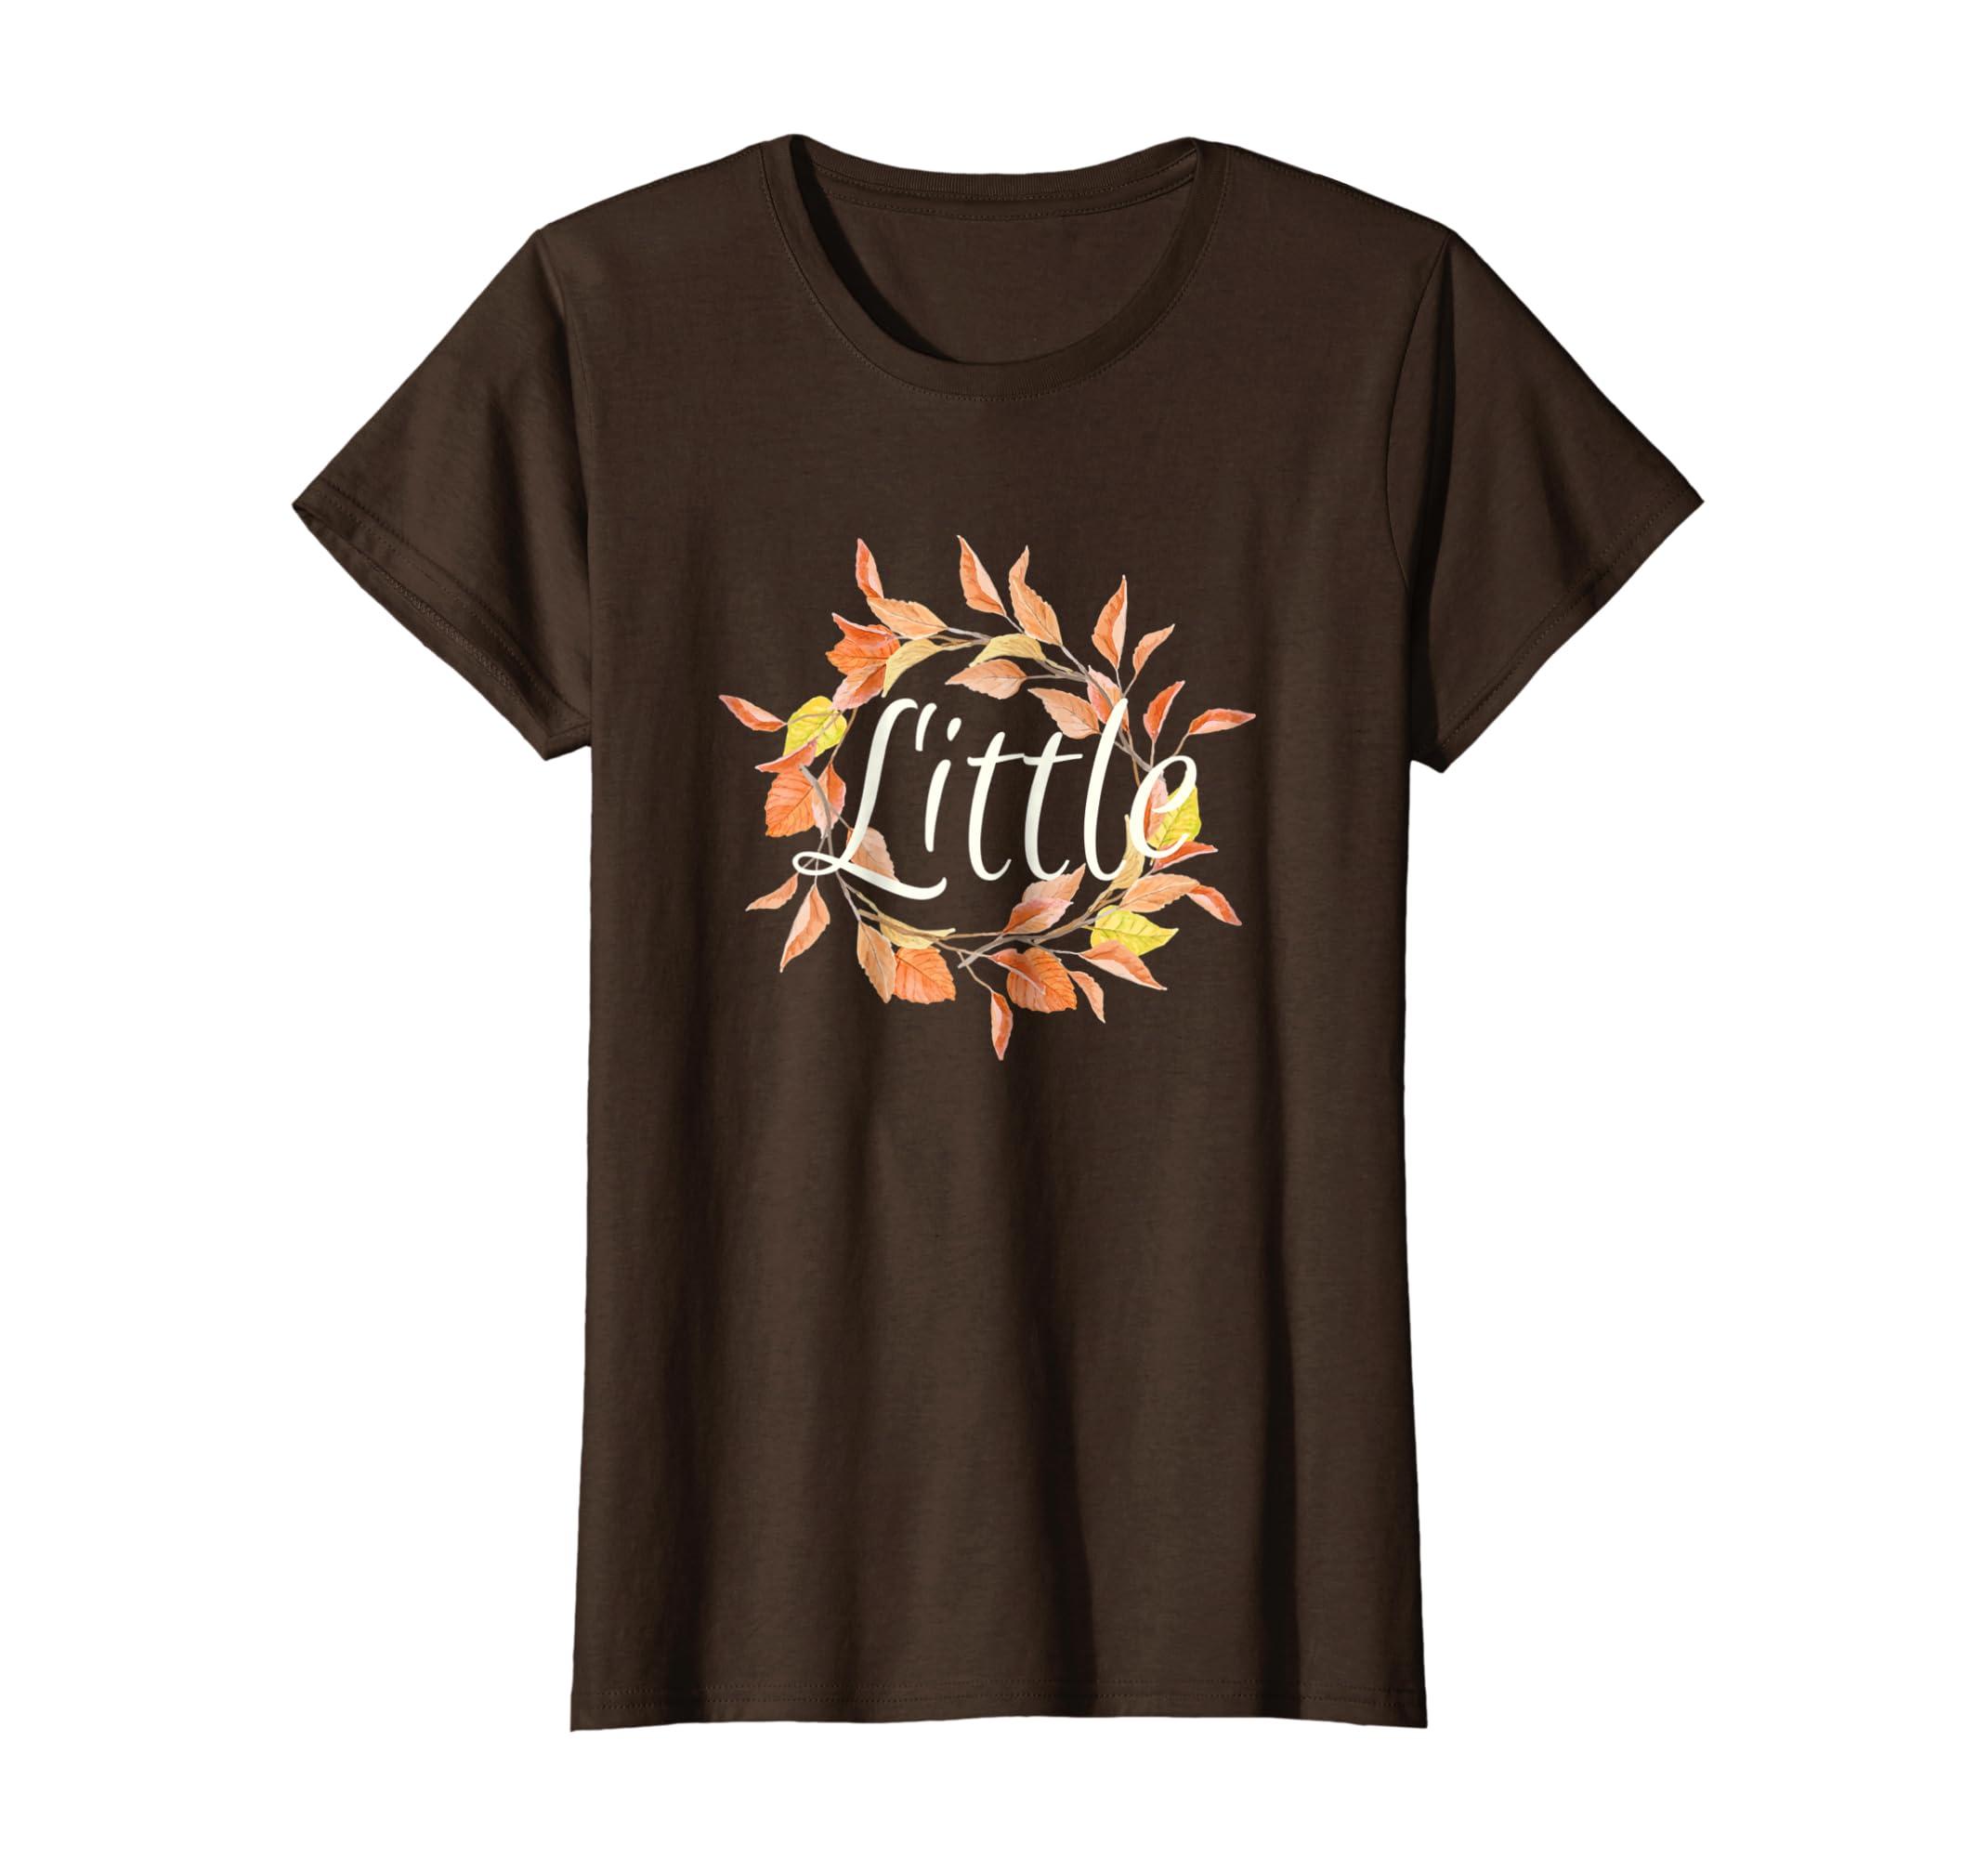 Autumn Fall Halloween Big Little Matching Sorority Shirt-Teechatpro